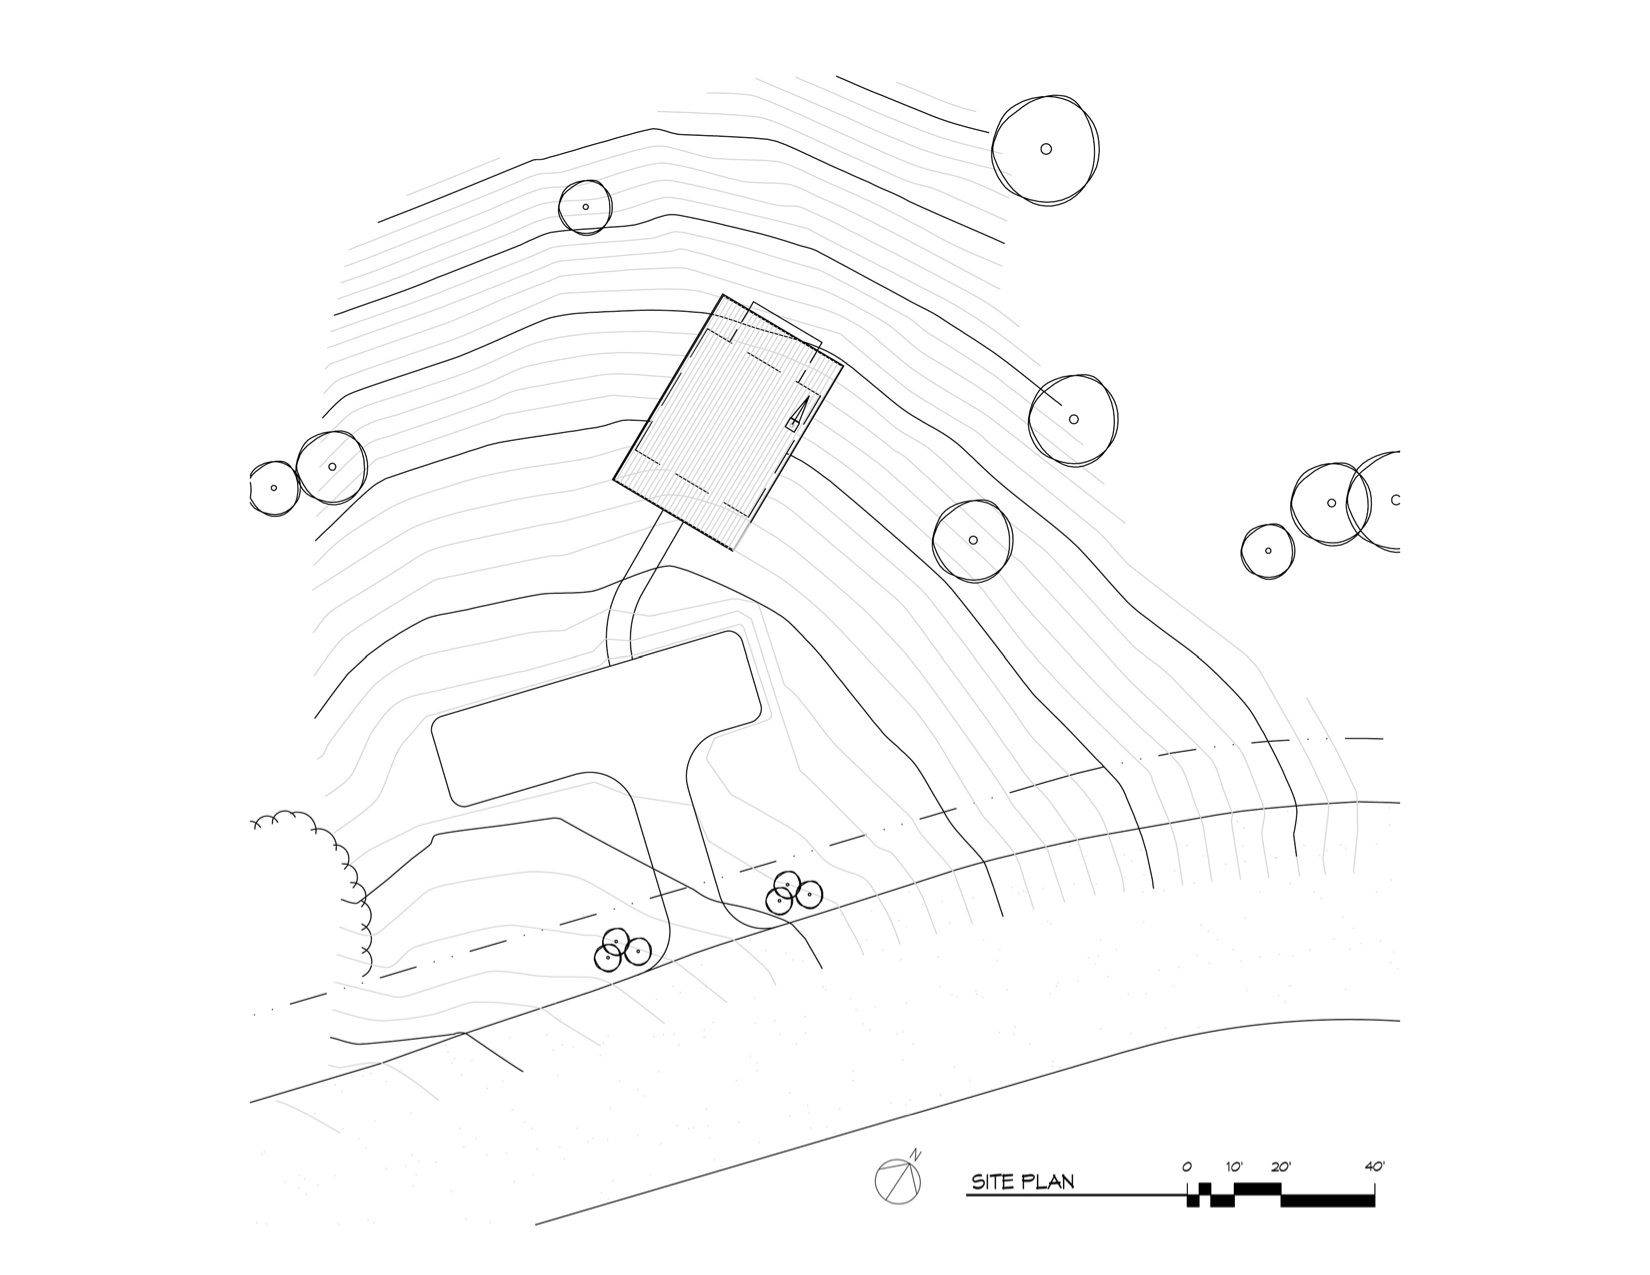 0606_siteplan_northarrow